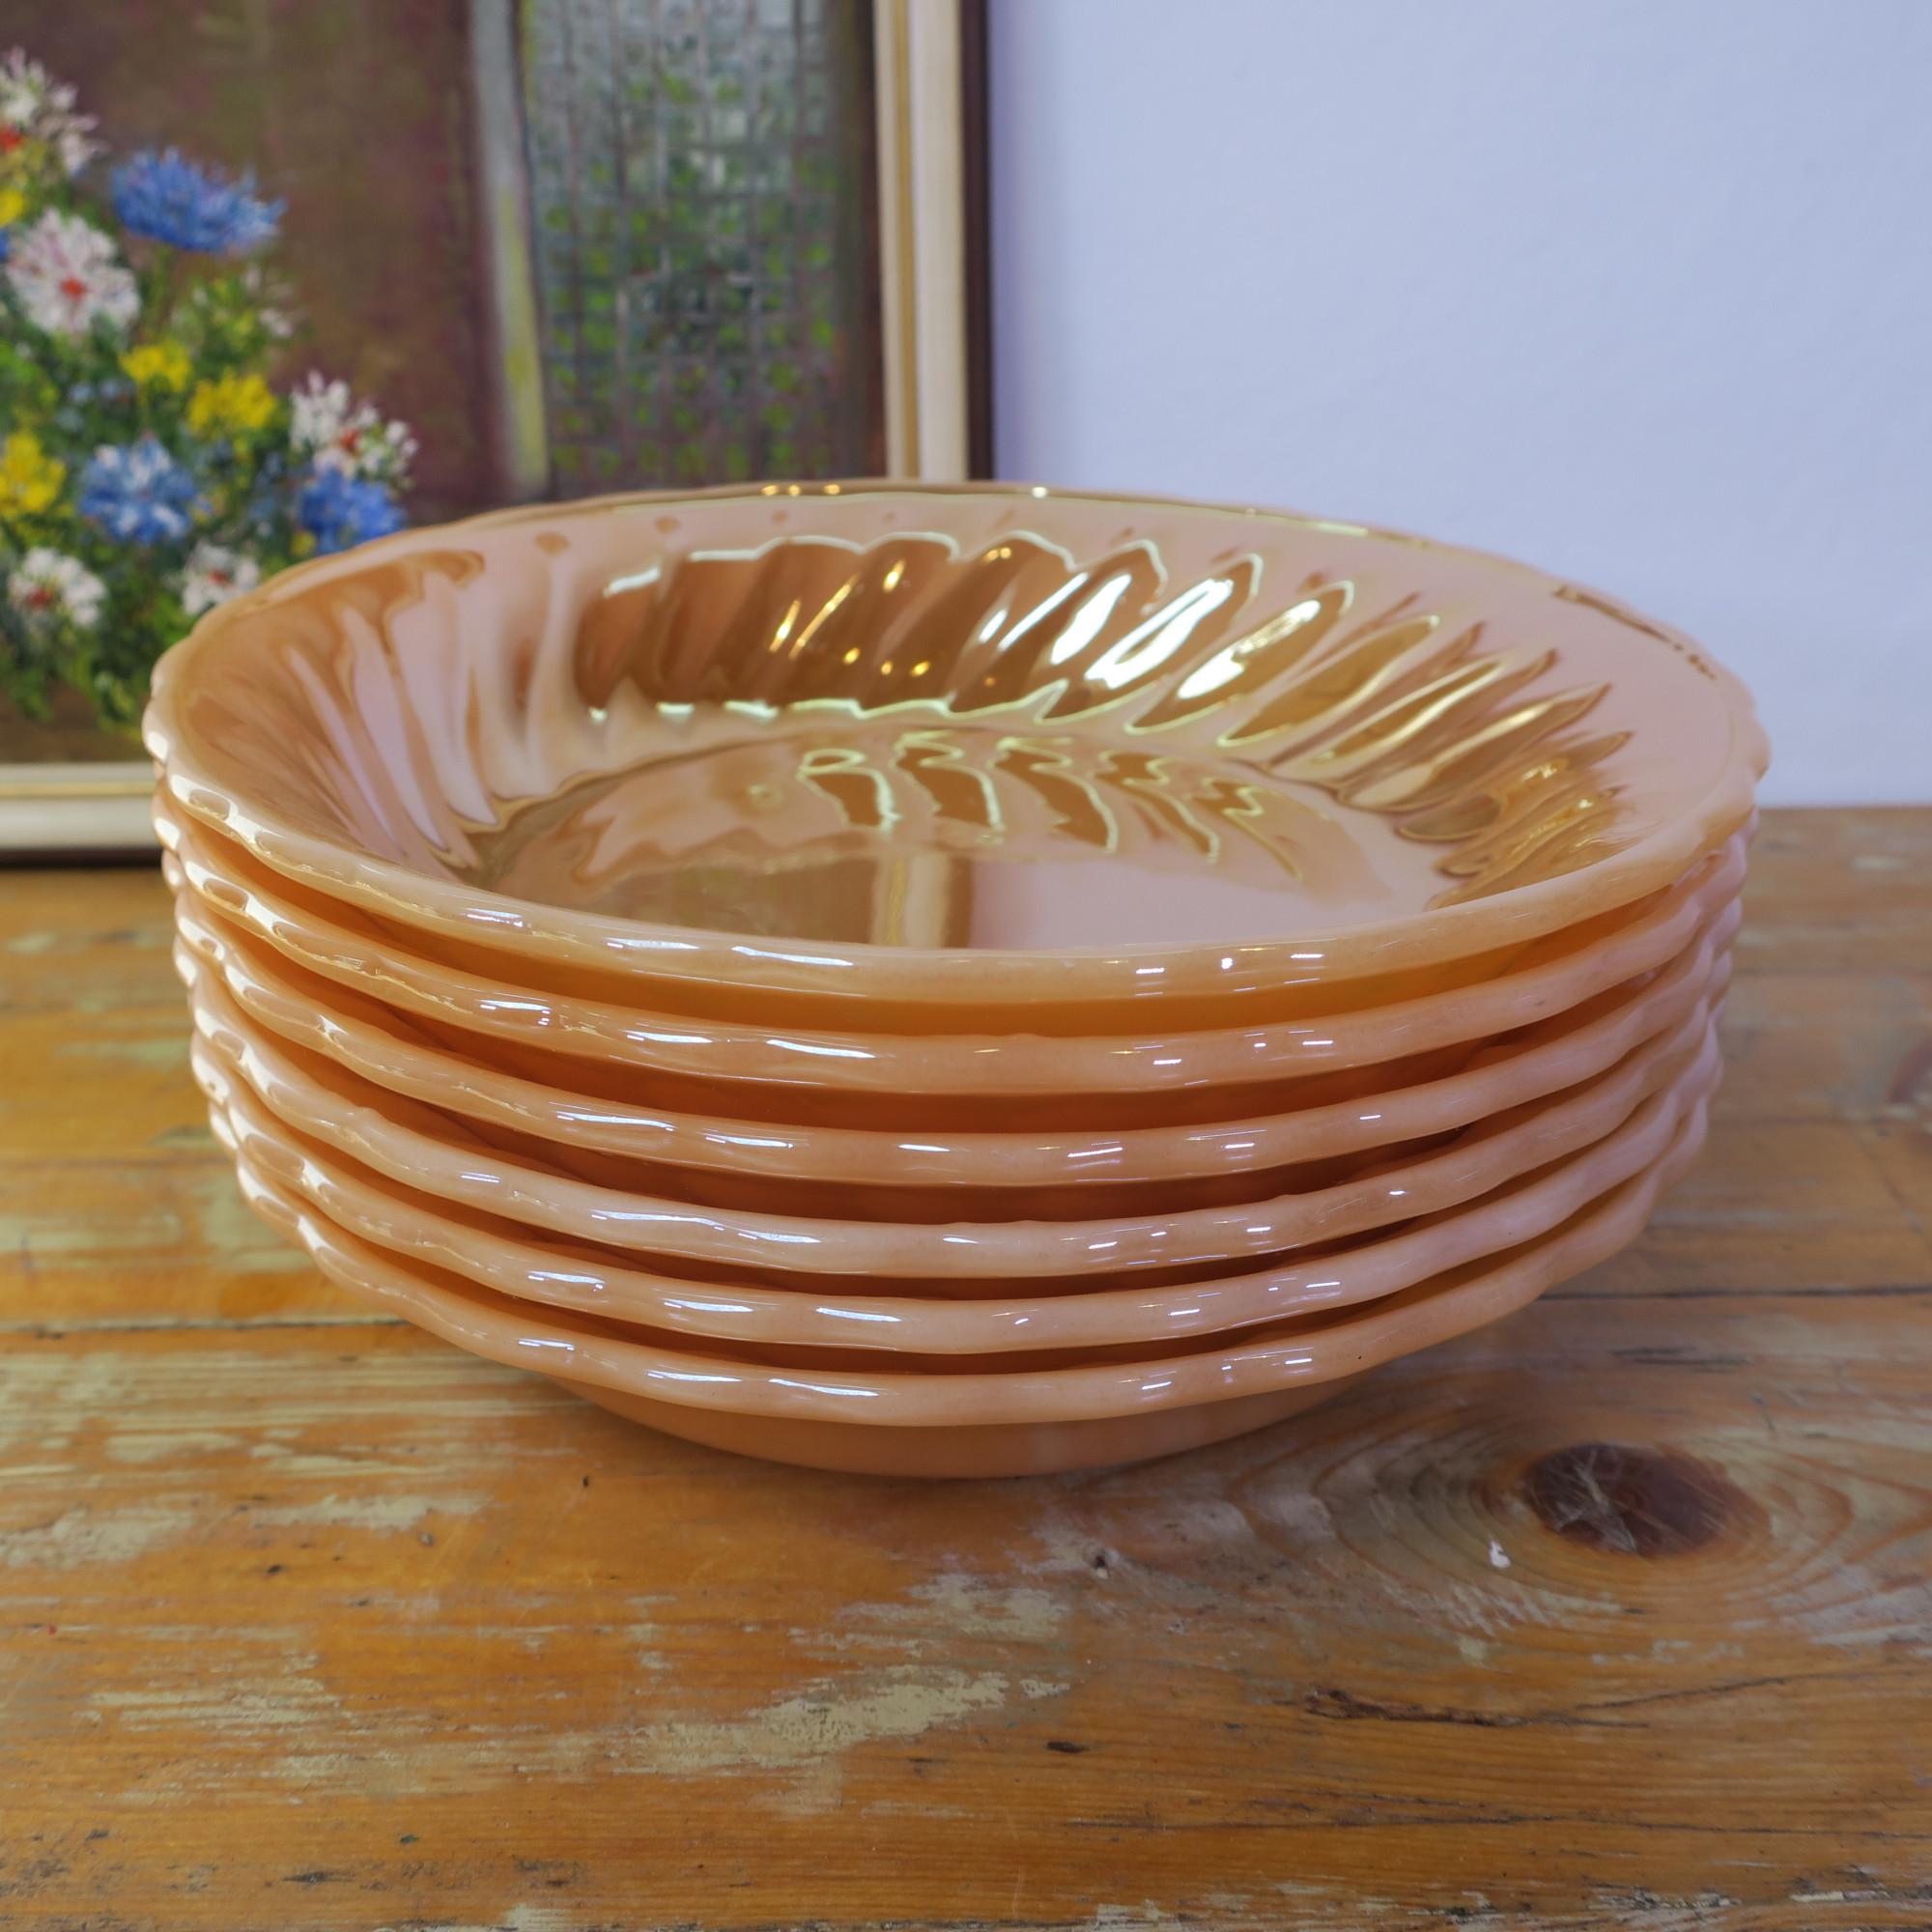 Vintage 70s Anchor Hocking Fire King Peach Luster Swirl Deep Plates Set Of 6 Retroriek